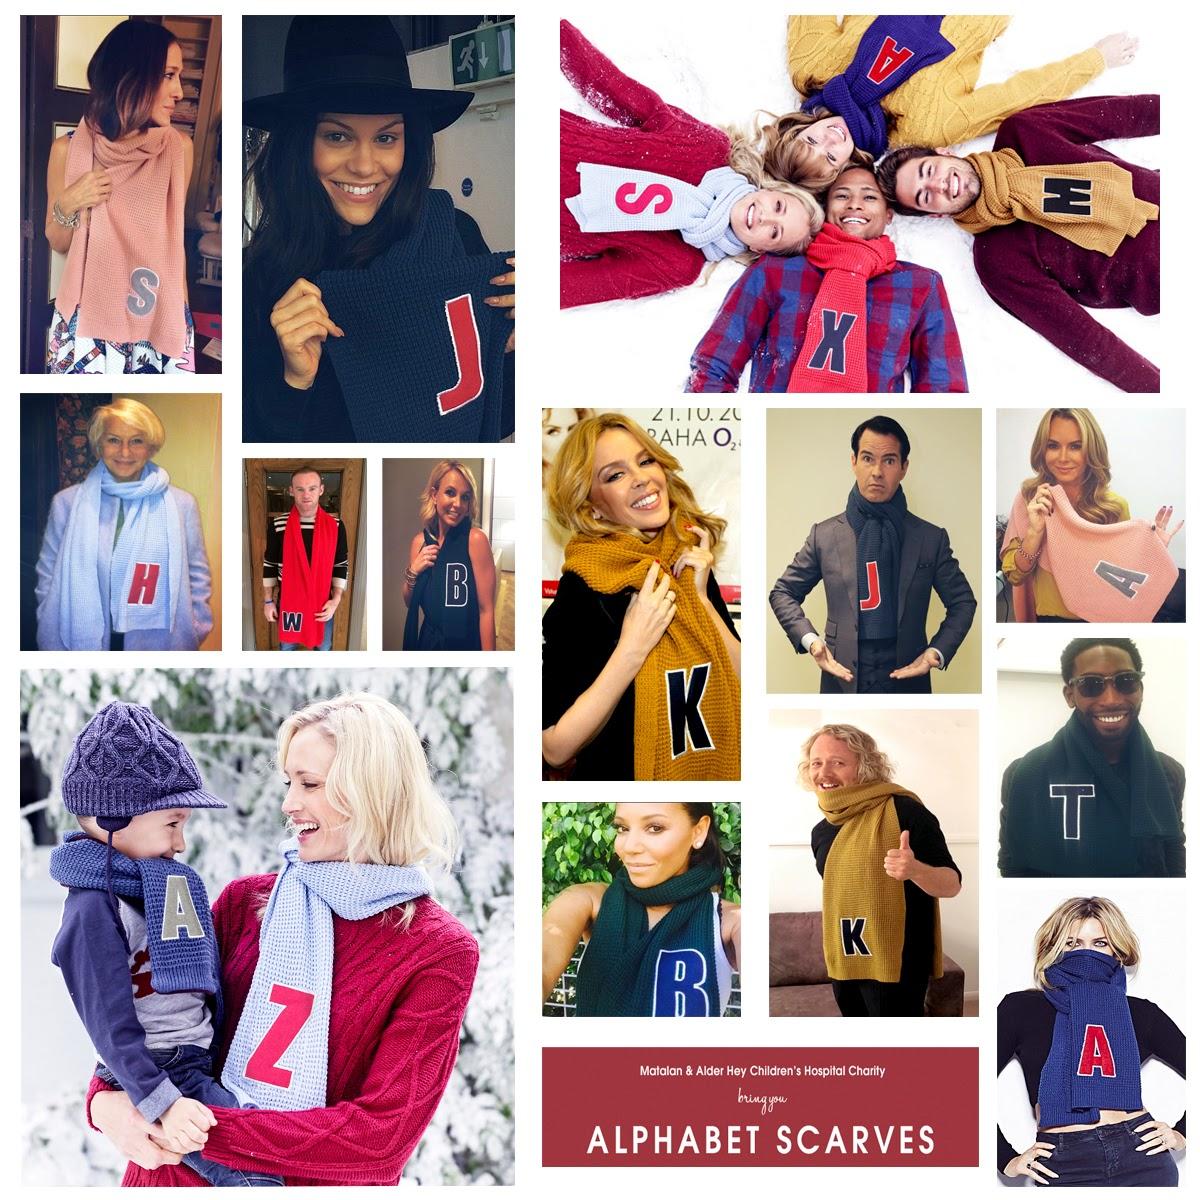 Matalan Alphabet Scarves For Alder Hey Children S Charity Aimee Dot